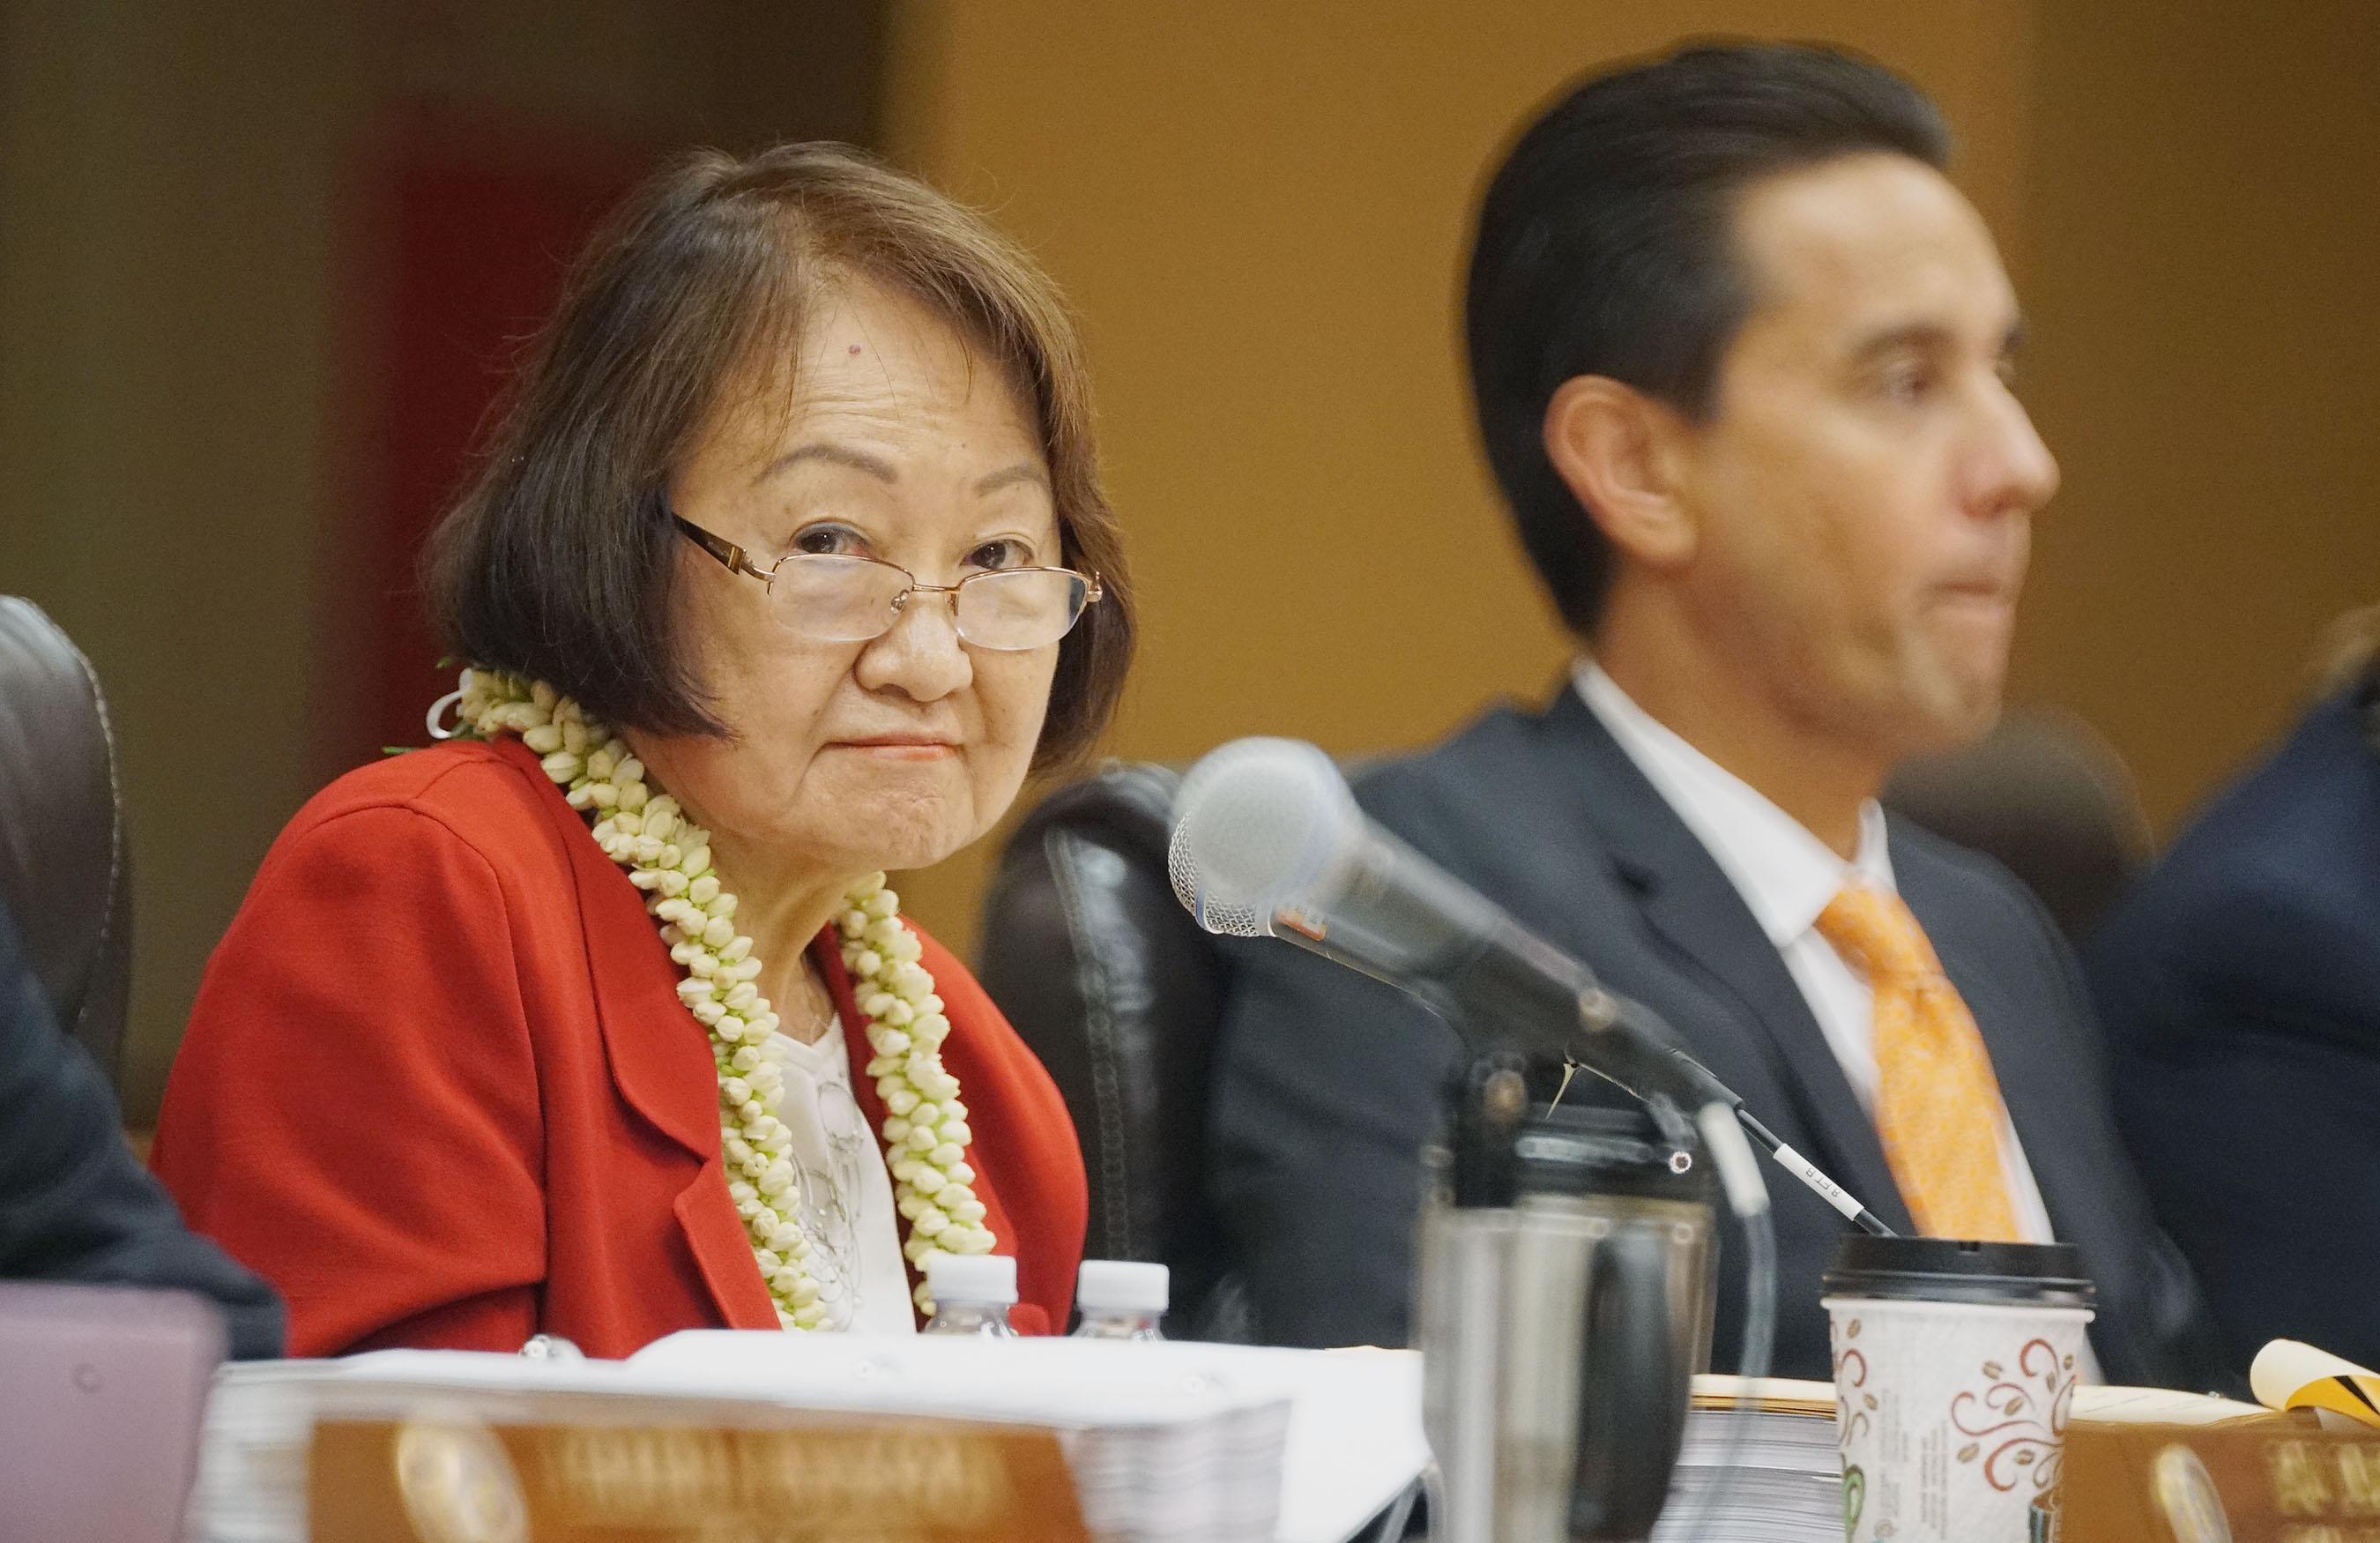 Honolulu City Council member Ann Kobayashi. 1 june 2016